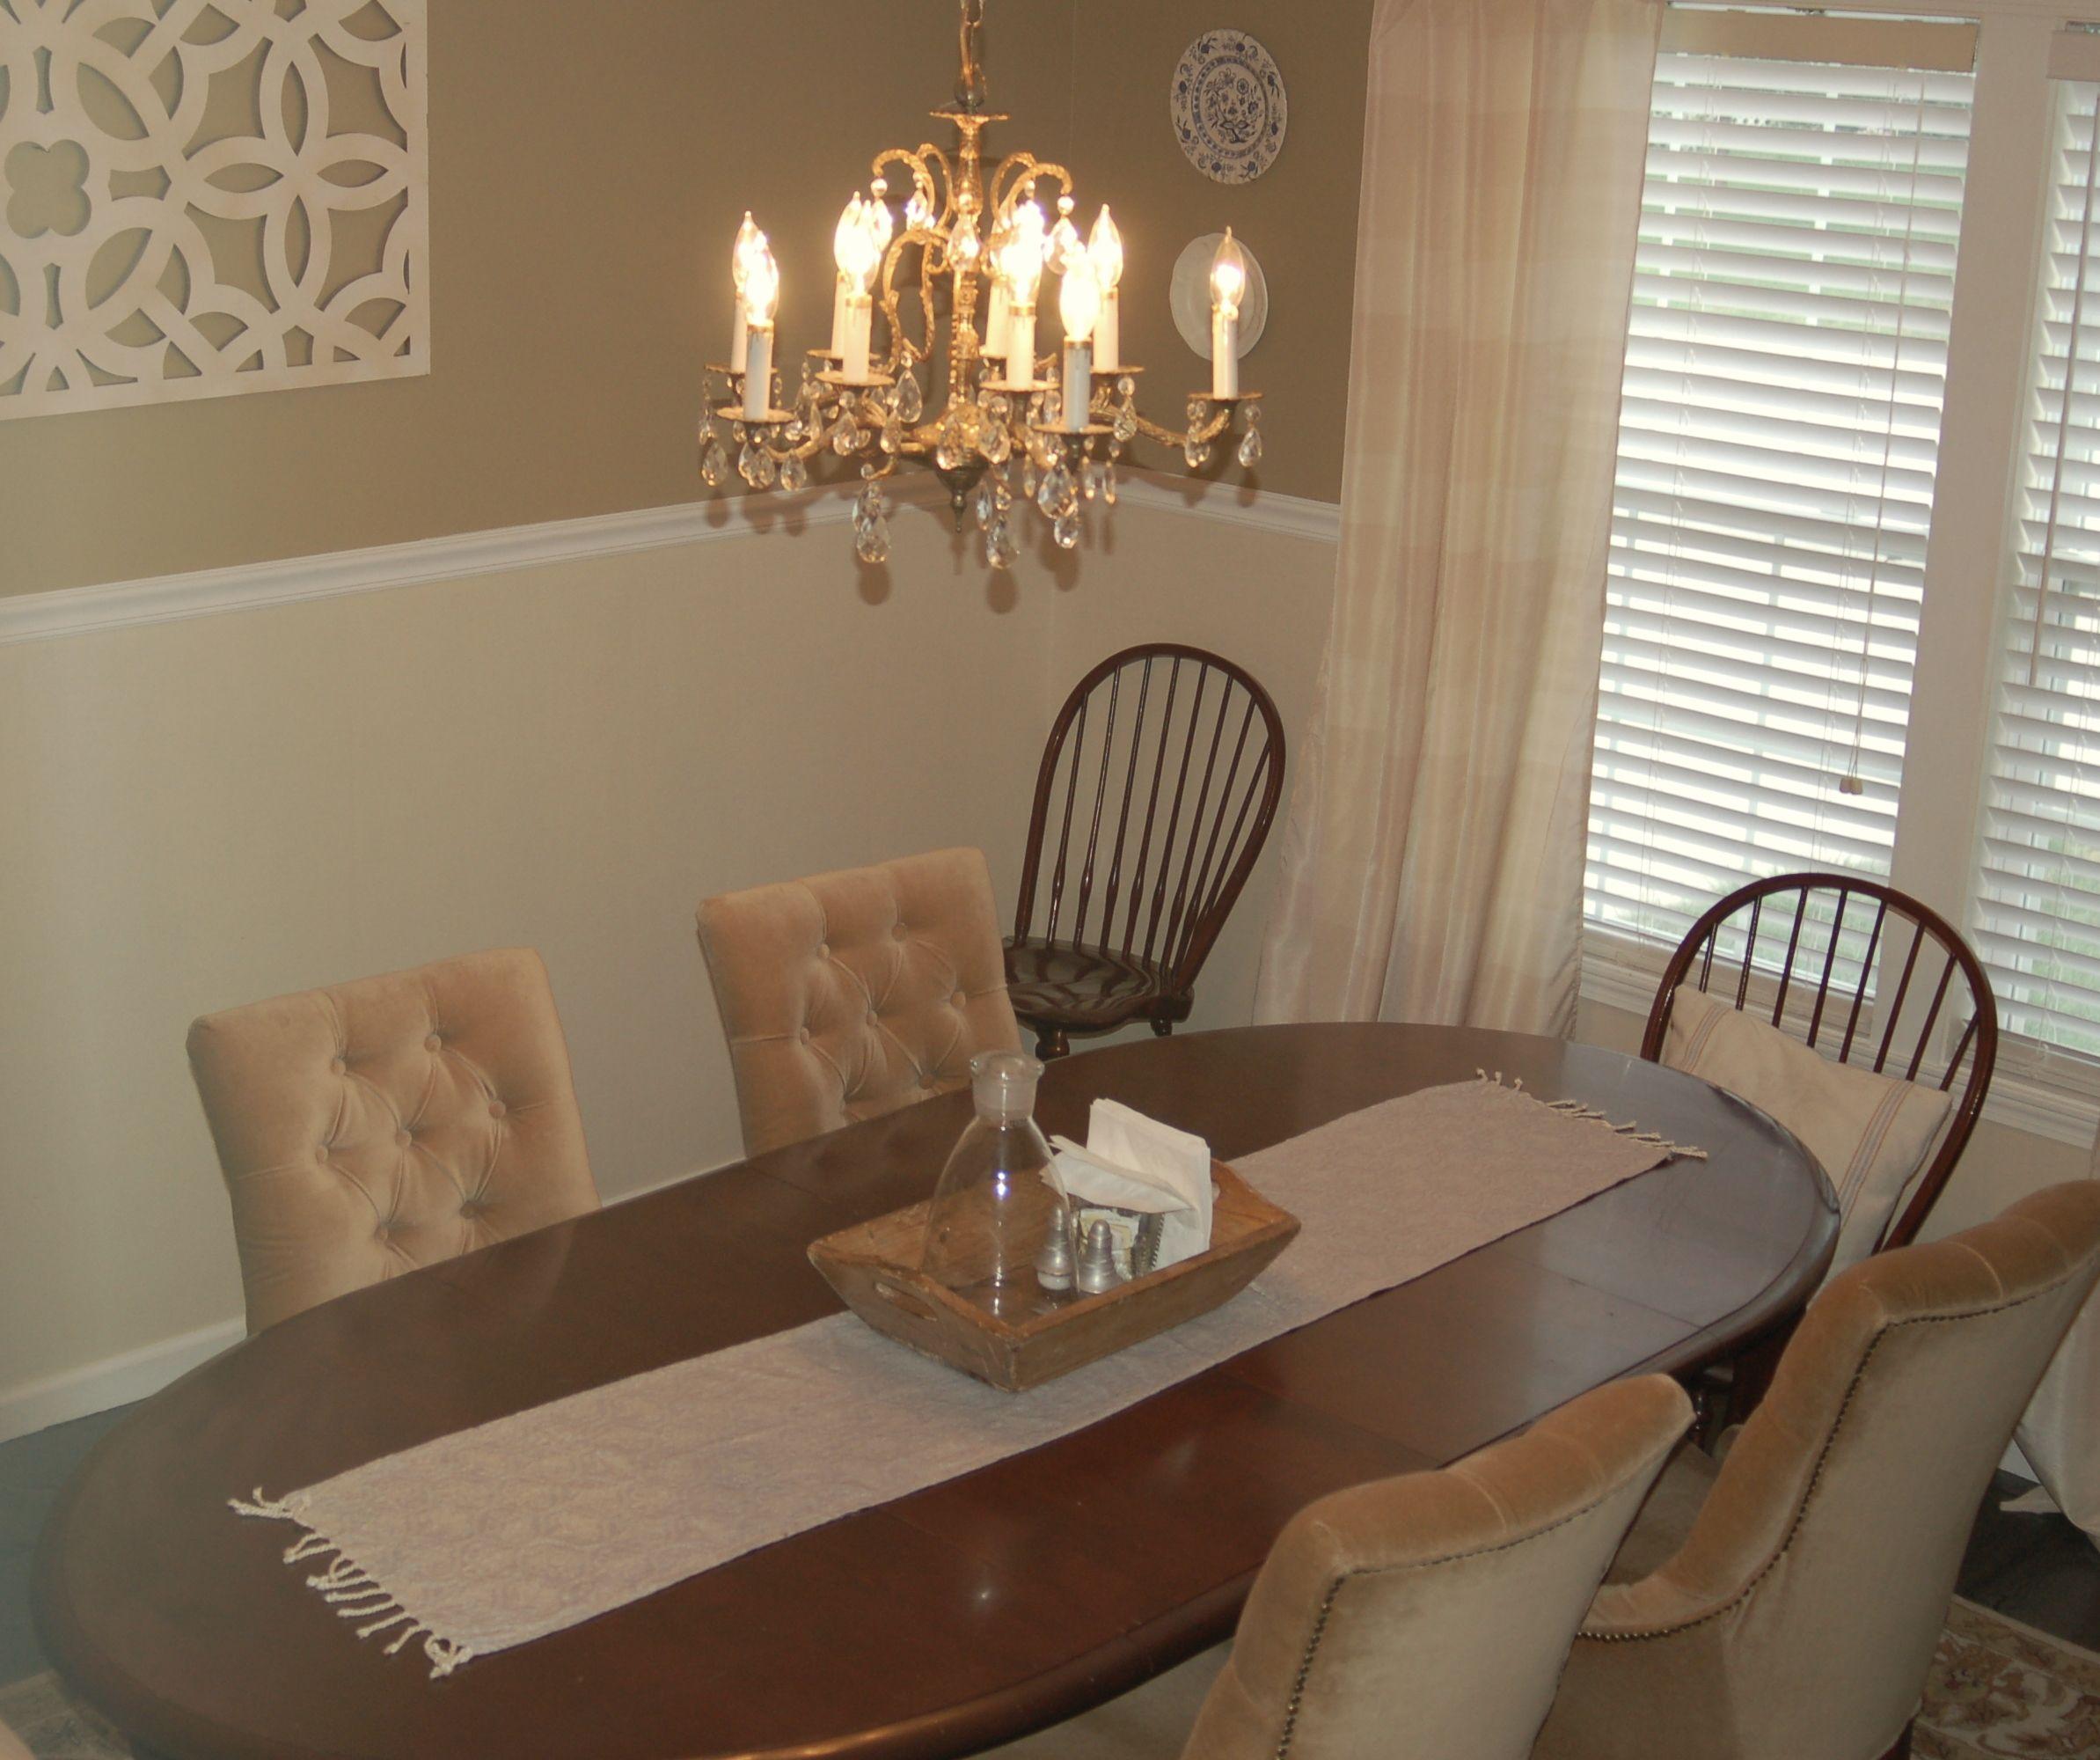 Beige Dining Room  Dining Rooms  Pinterest  Beige Dining Room Inspiration Long Dining Room Tables For Sale Decorating Design